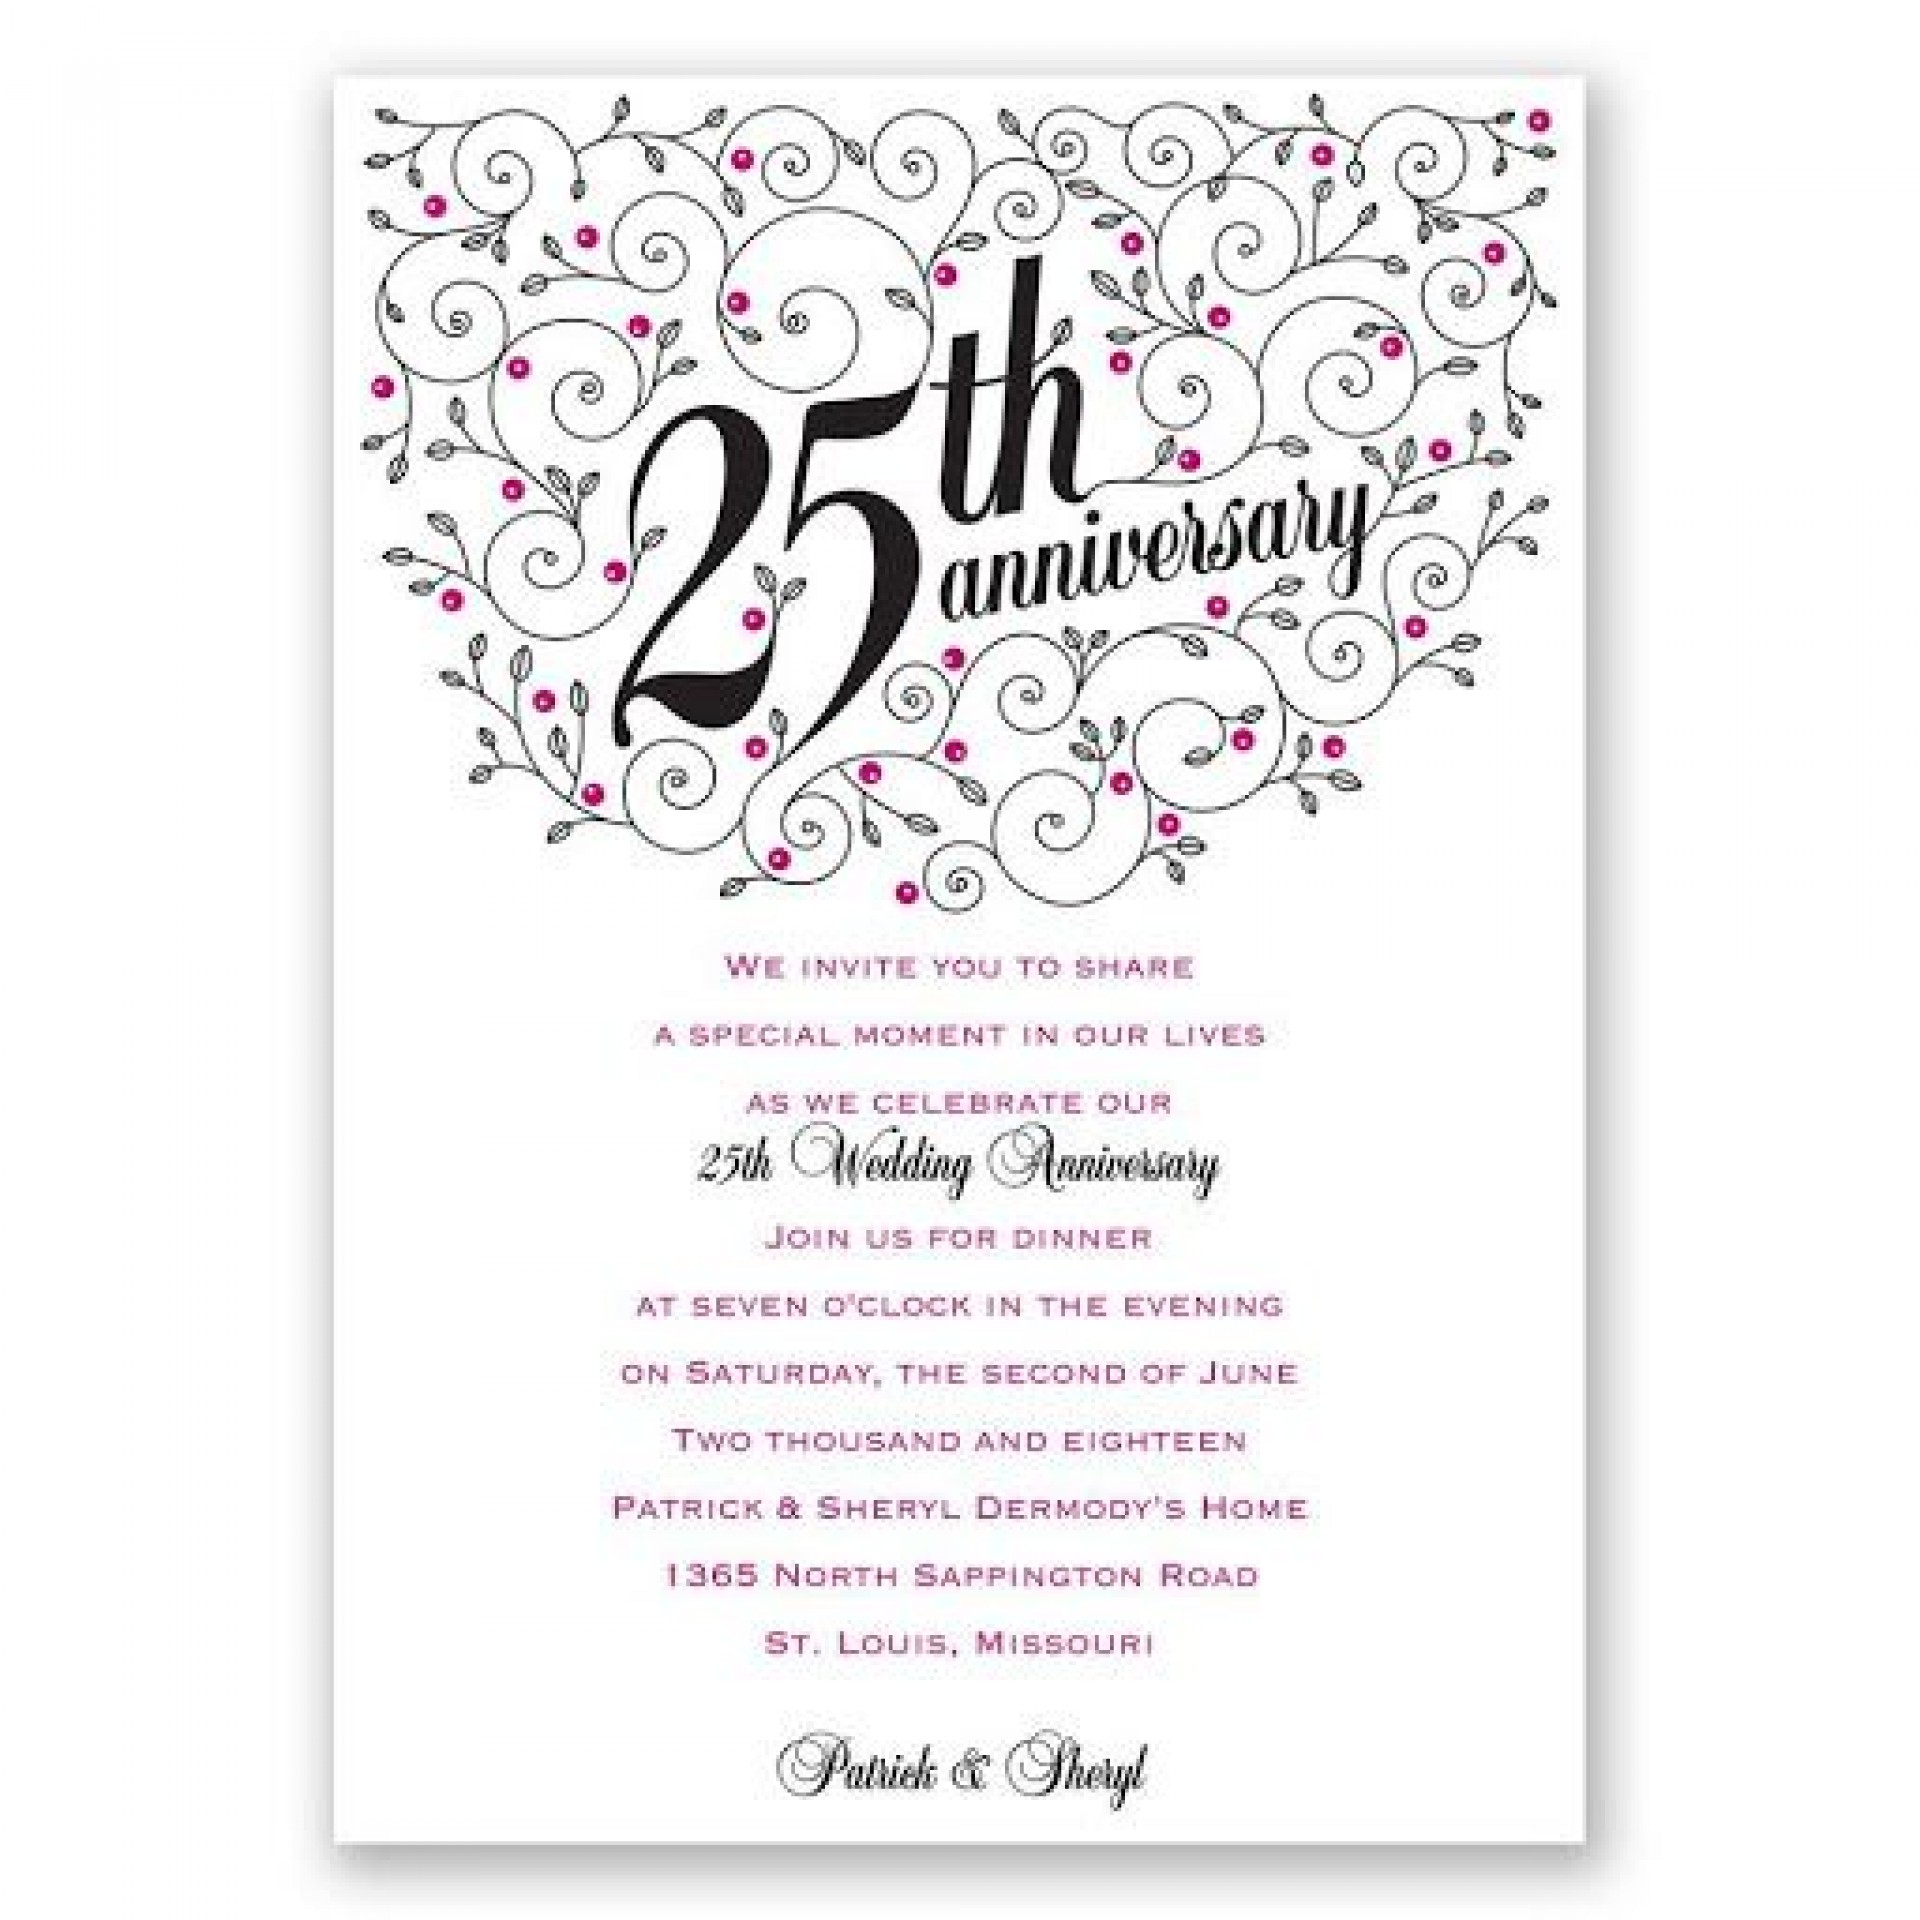 009 Fantastic 50th Anniversary Invitation Wording Sample Highest Clarity  Samples Wedding Card1920